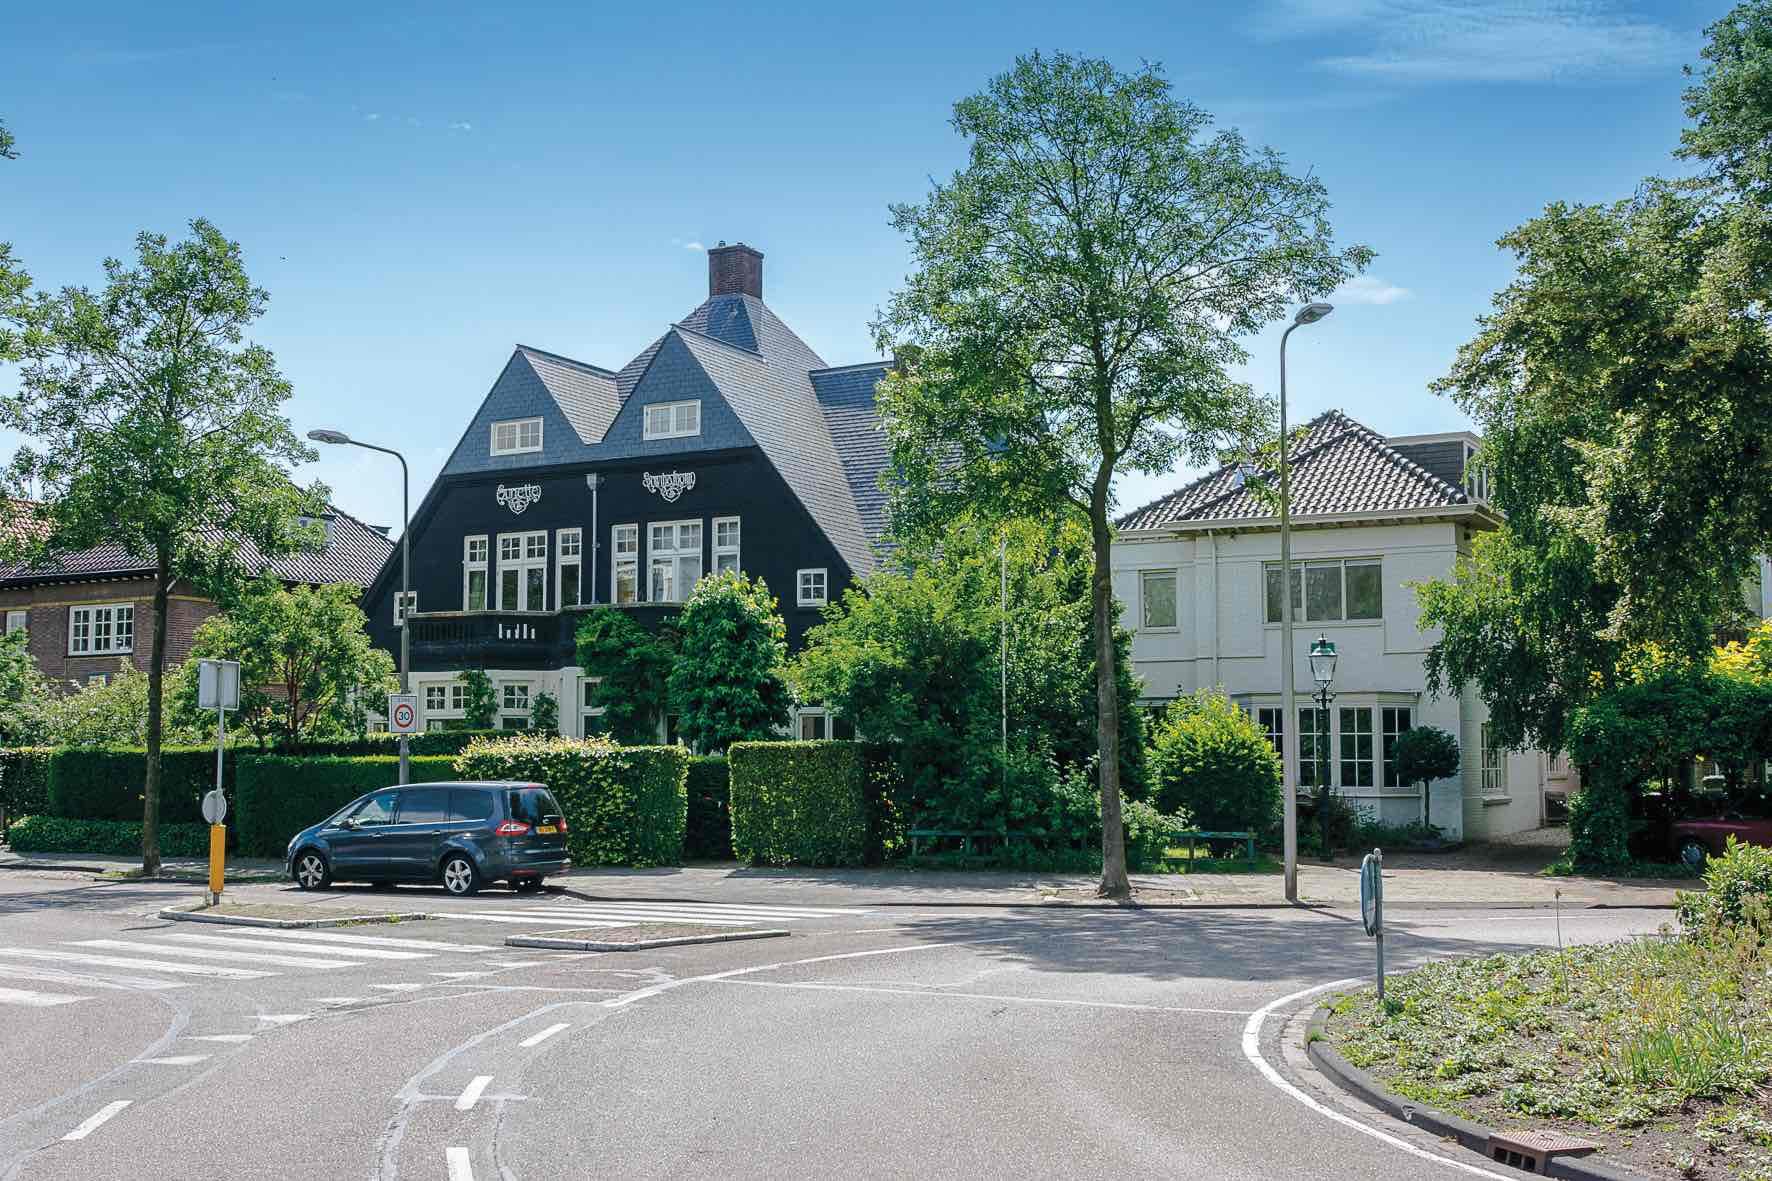 25-Villa-interlaken-_-Gramophone-house